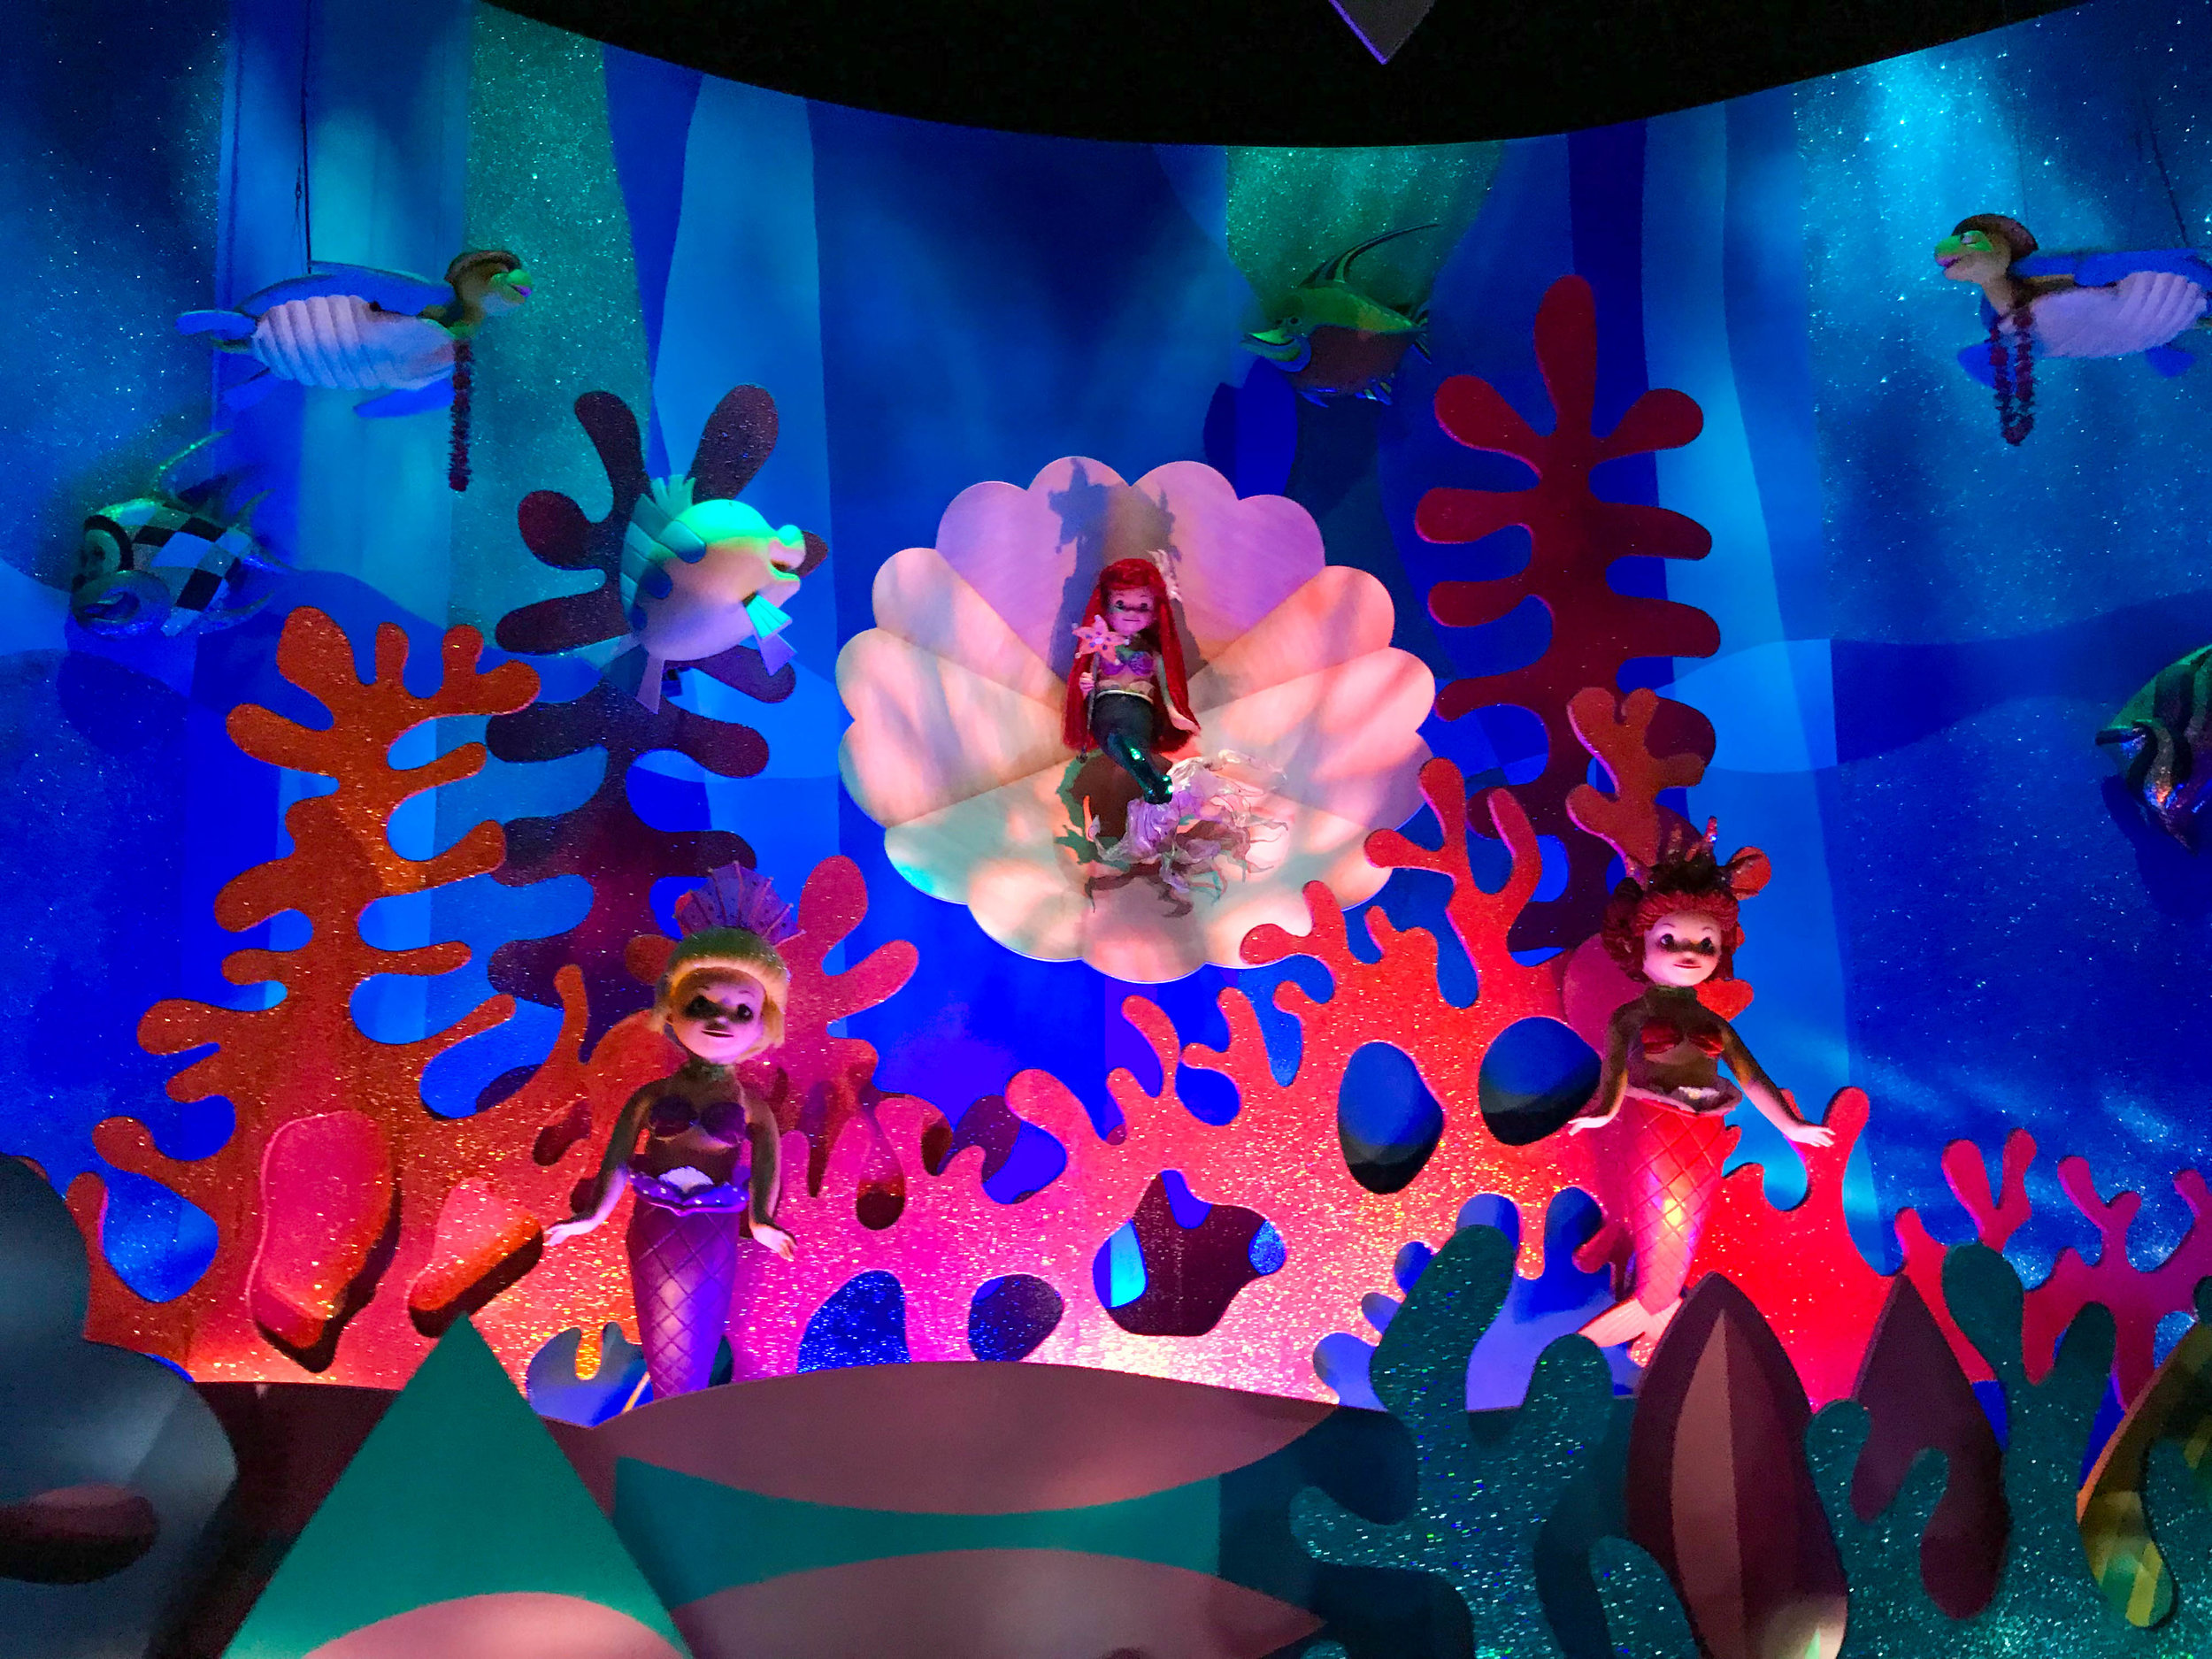 Hong Kong Disneyland - Small World Little Mermaid